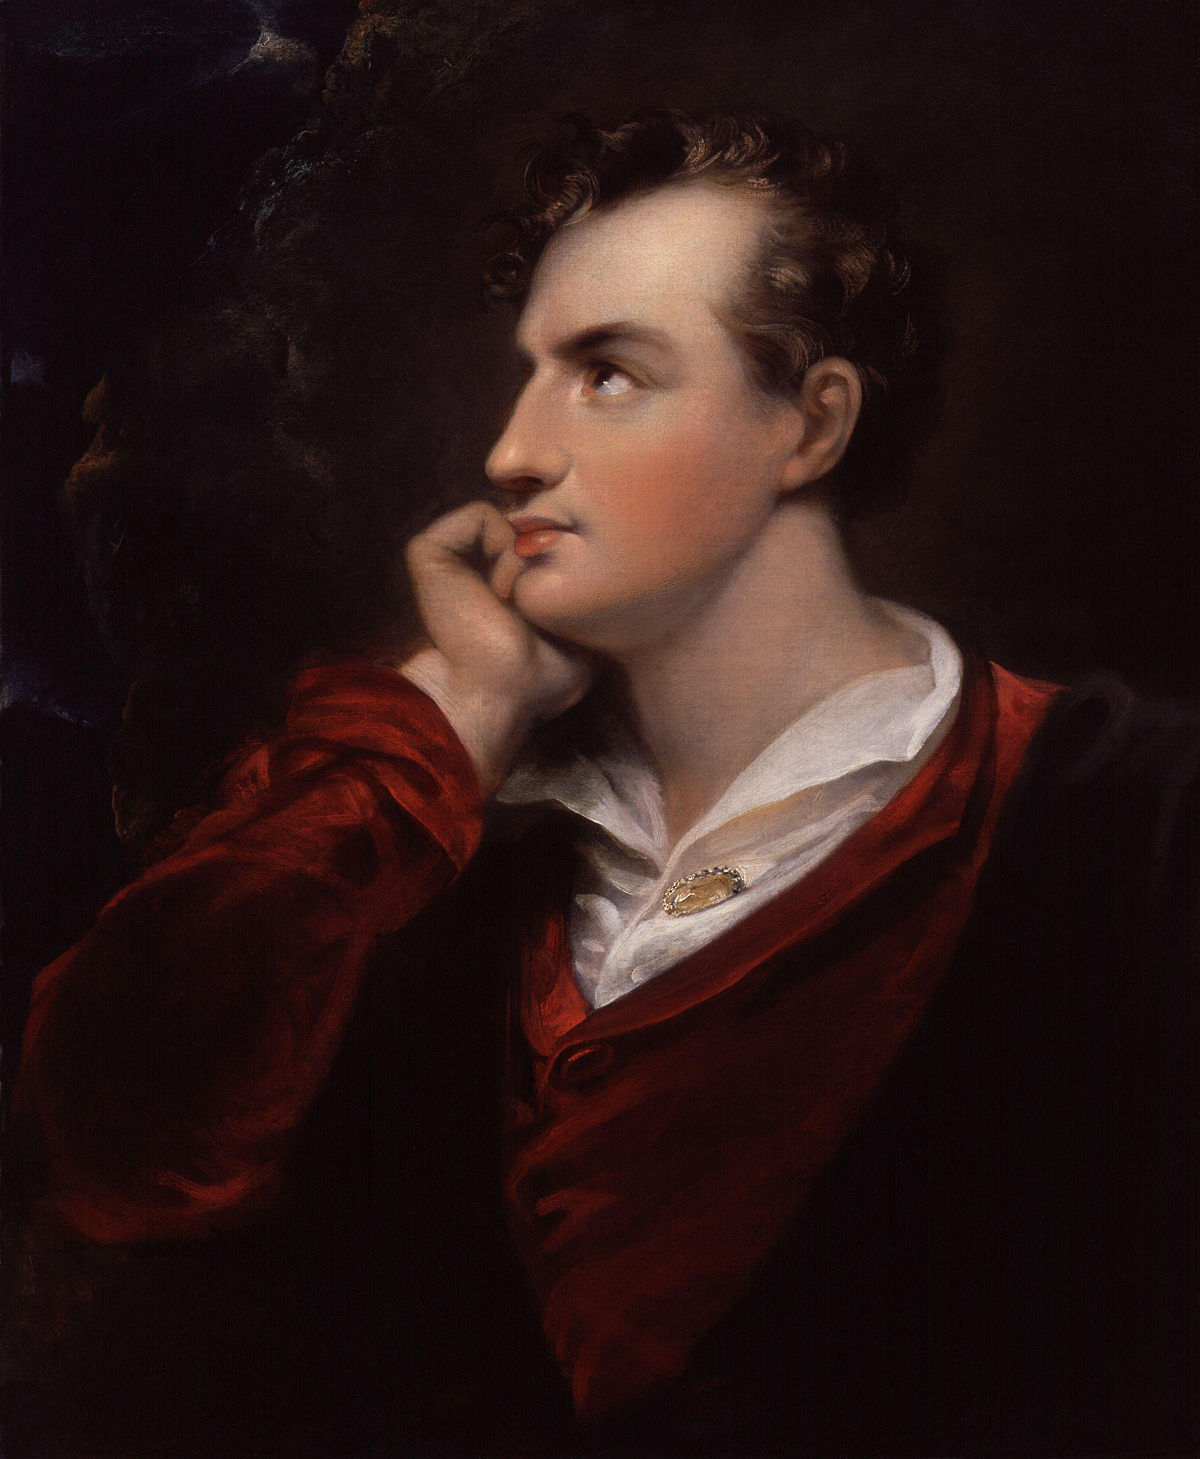 Lord Byron Wikipedia